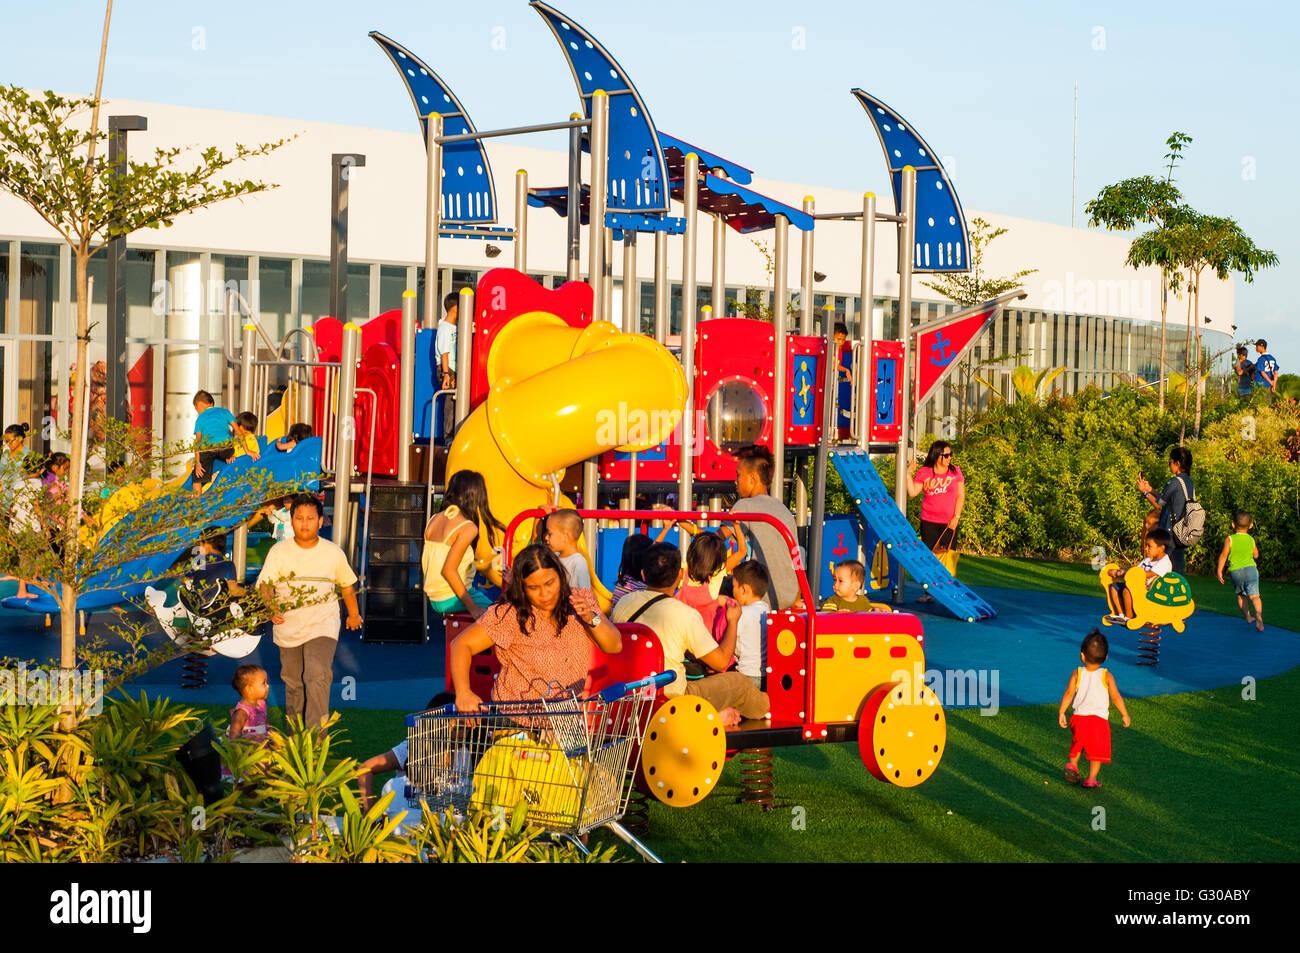 área Infantil 3er Piso Terraza Cubierta Sm Seaside Mall